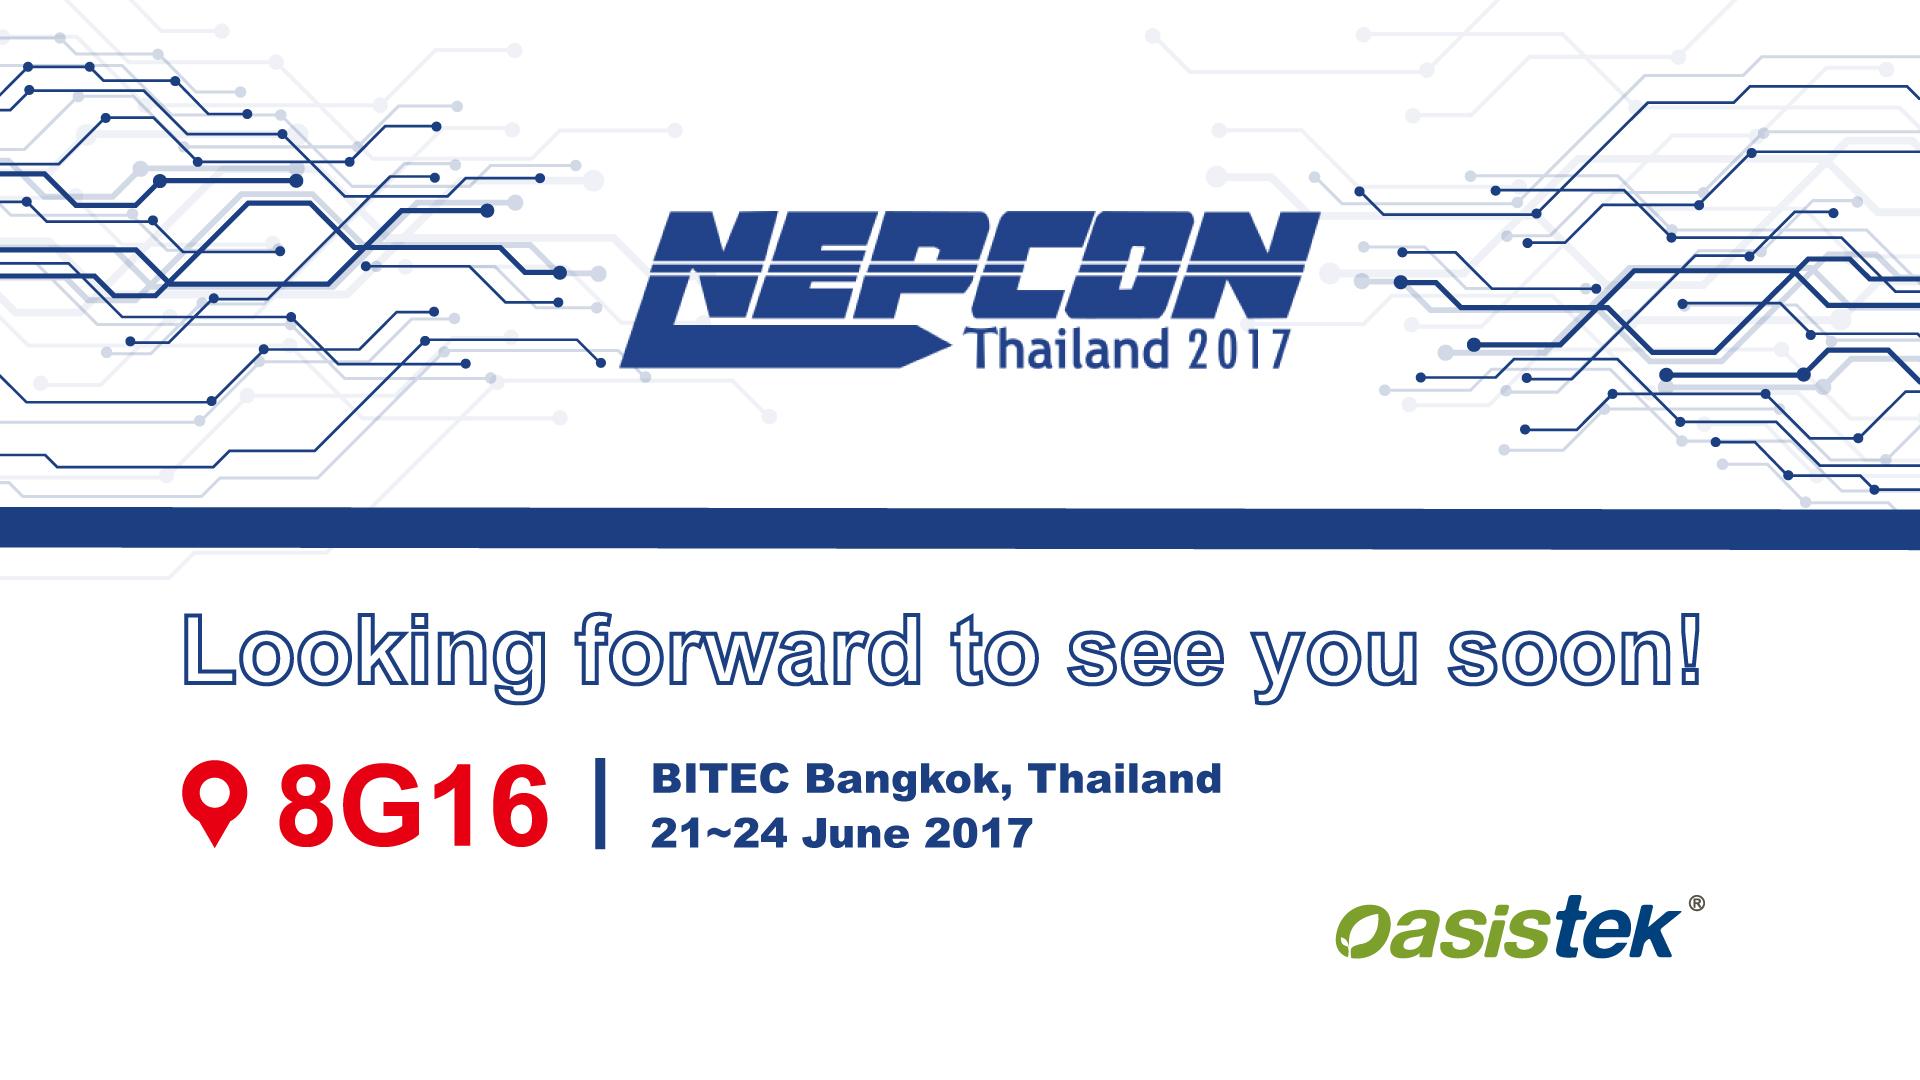 NEPCON Thailand 2017 - Oasistek